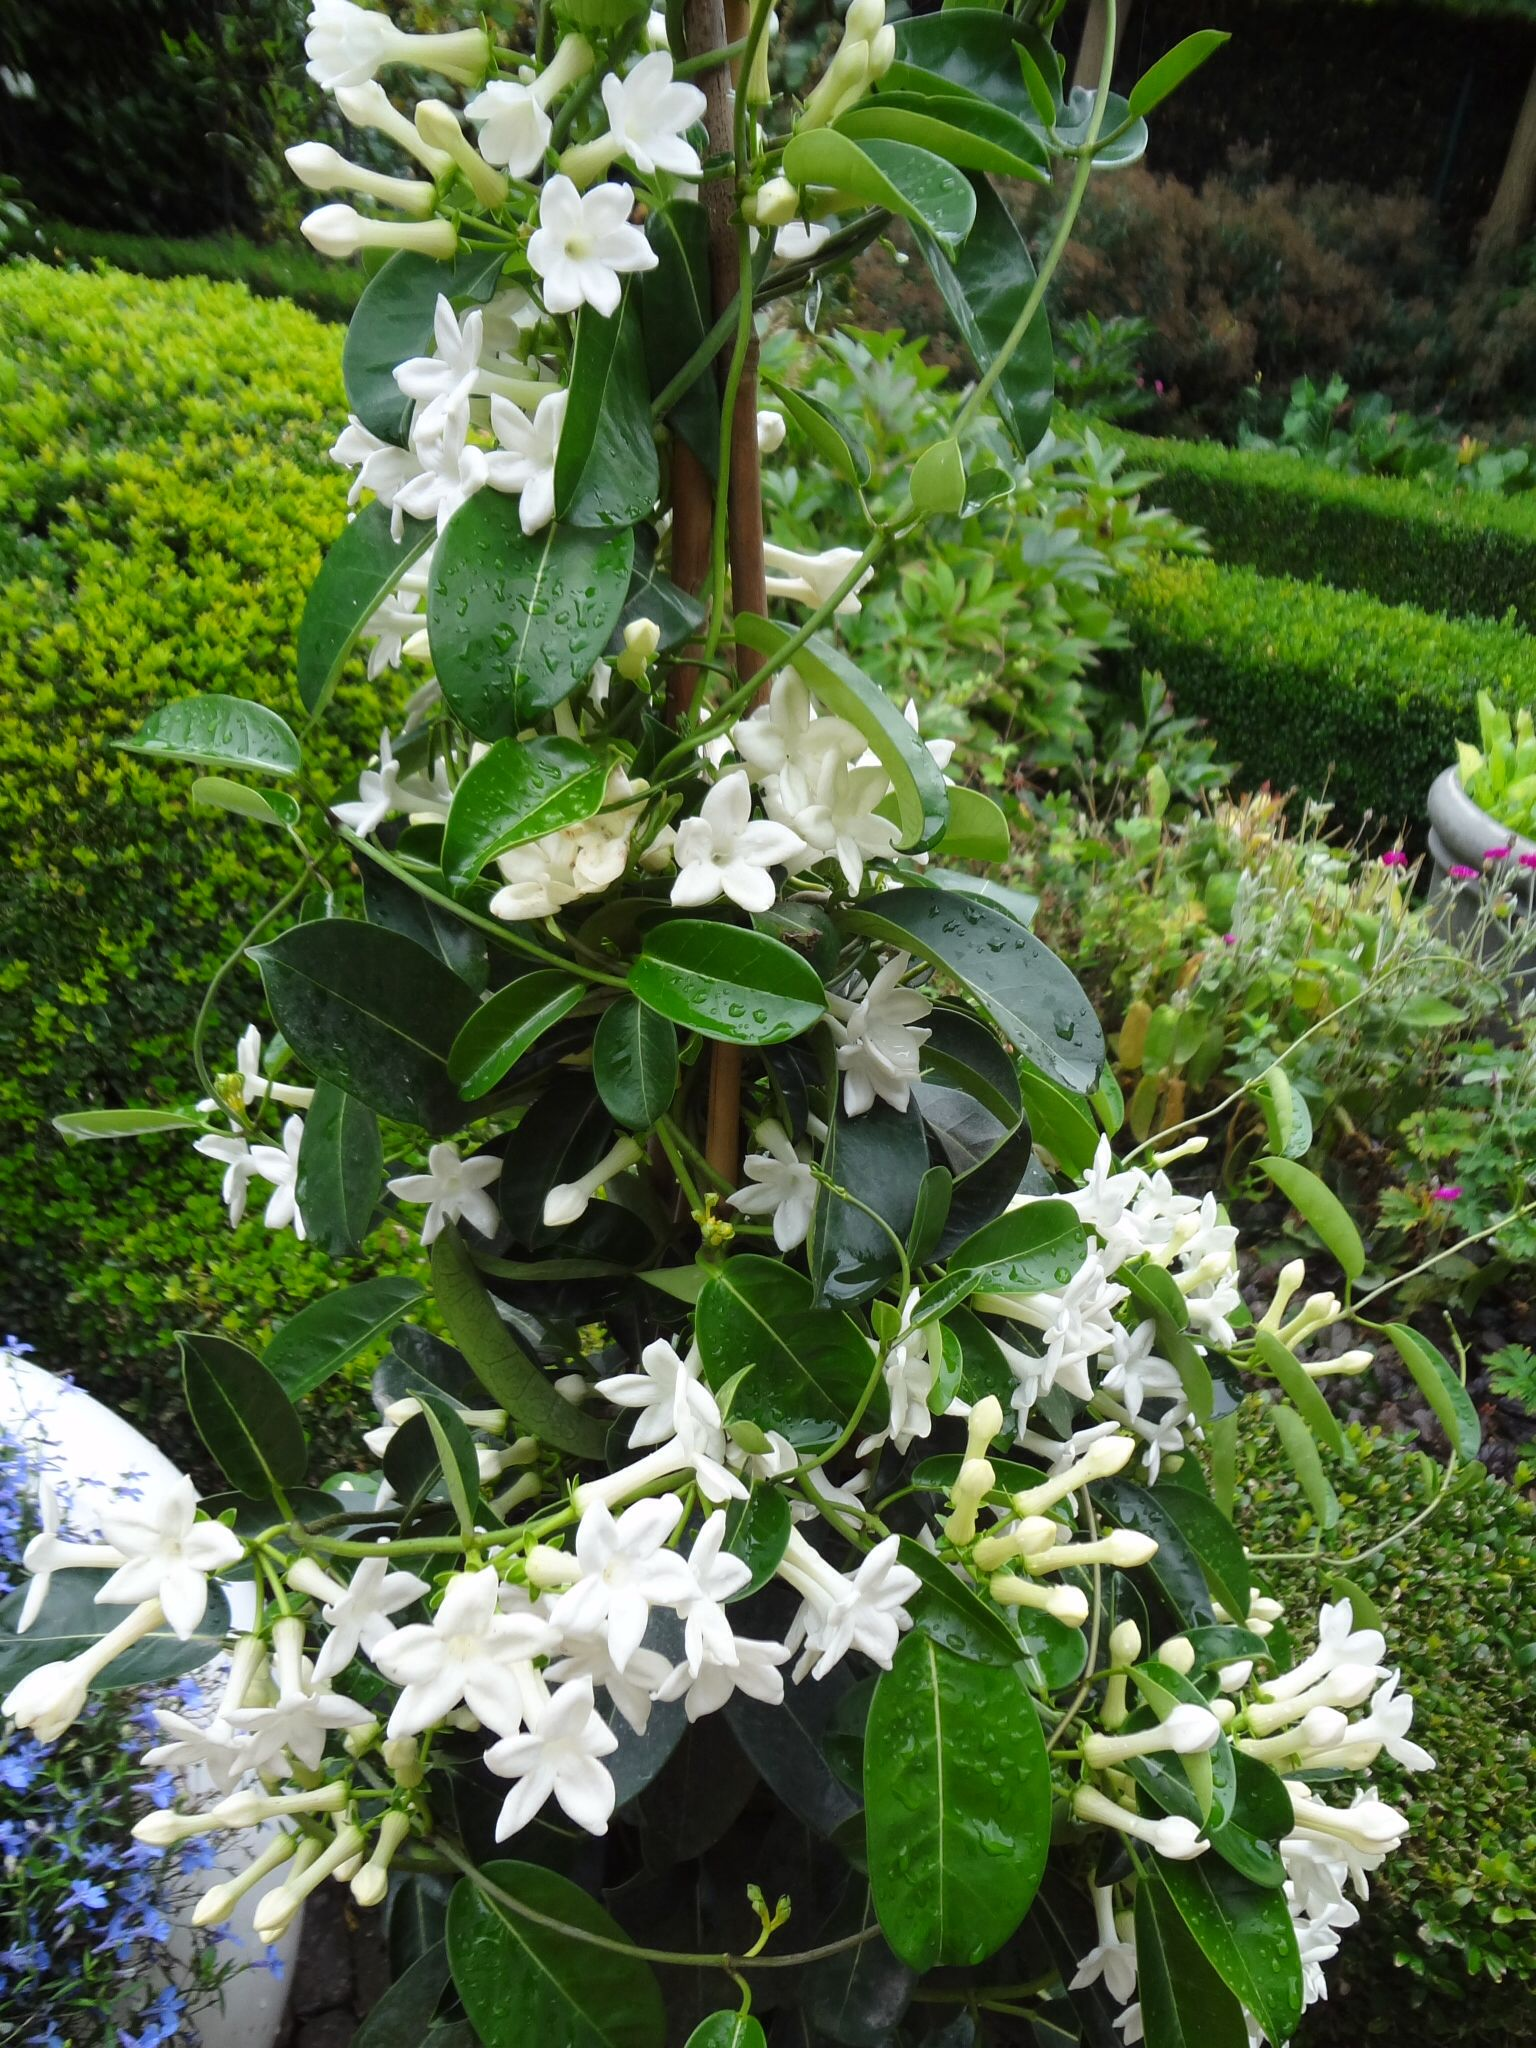 Orange Jasmine-Honey Bush Fragrance Flower Plant for Home Garden Courtyard Grow